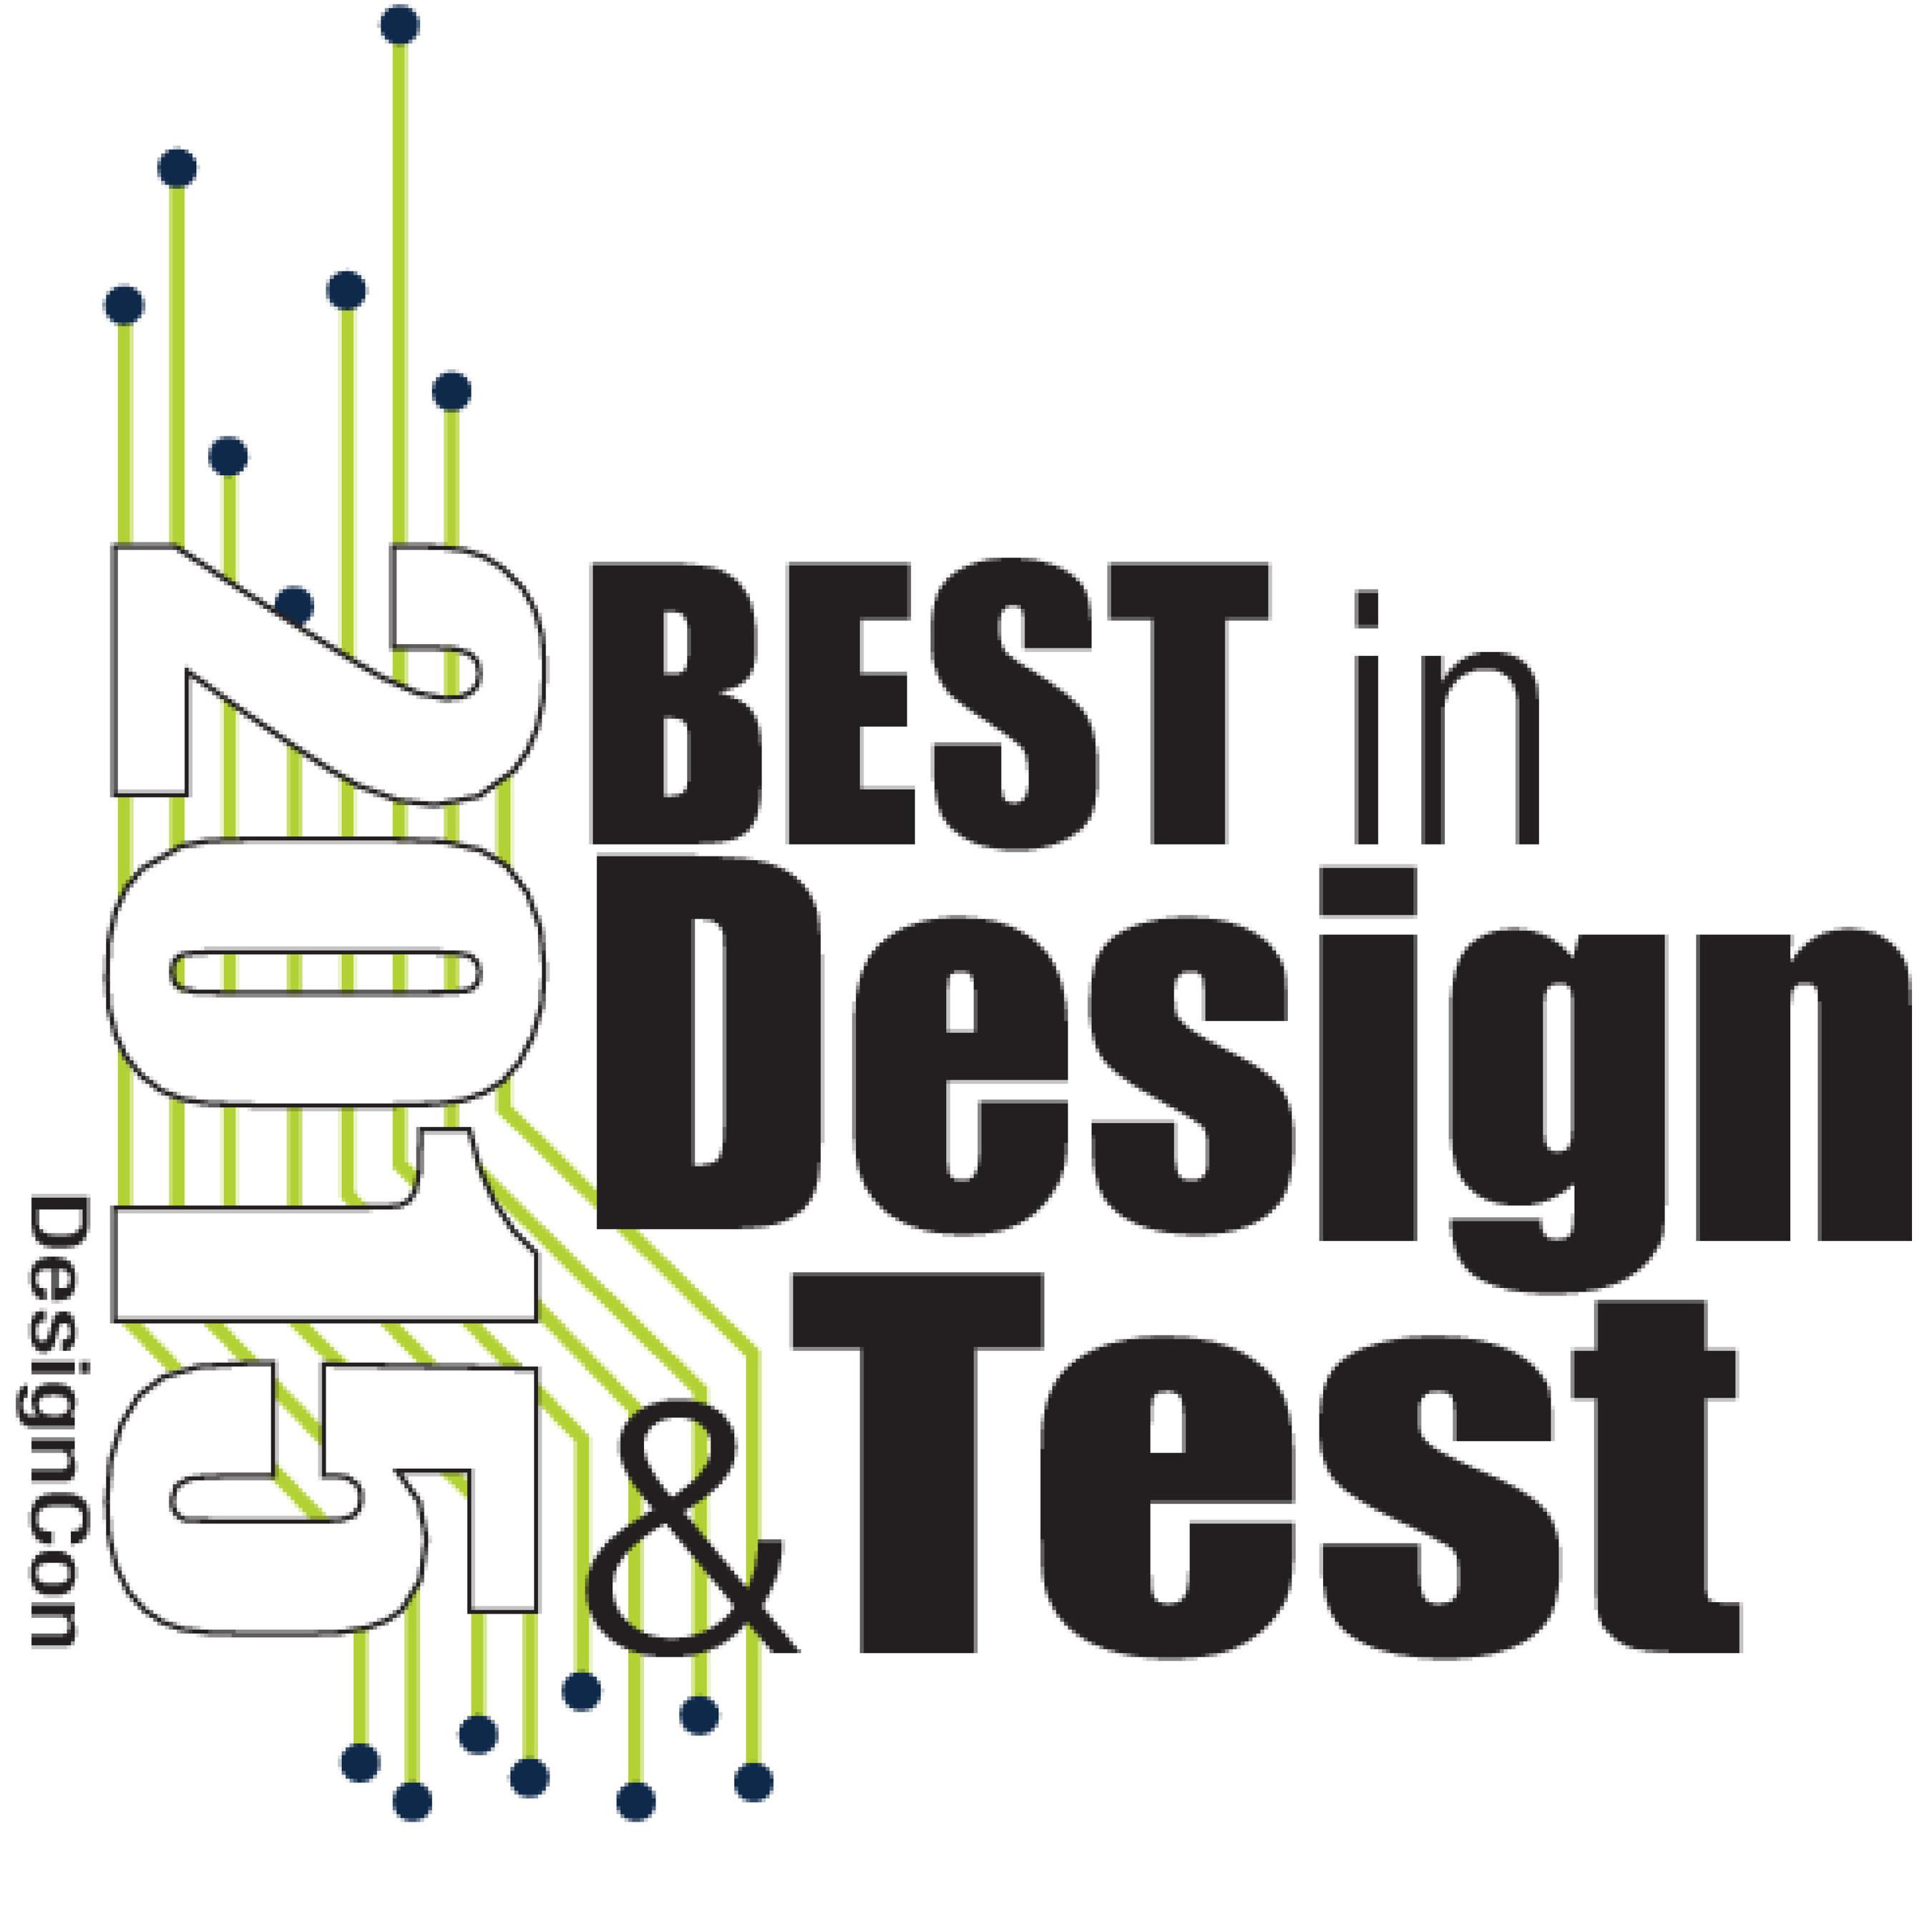 DesignCon - January 27-30 - Santa Clara Convention Center